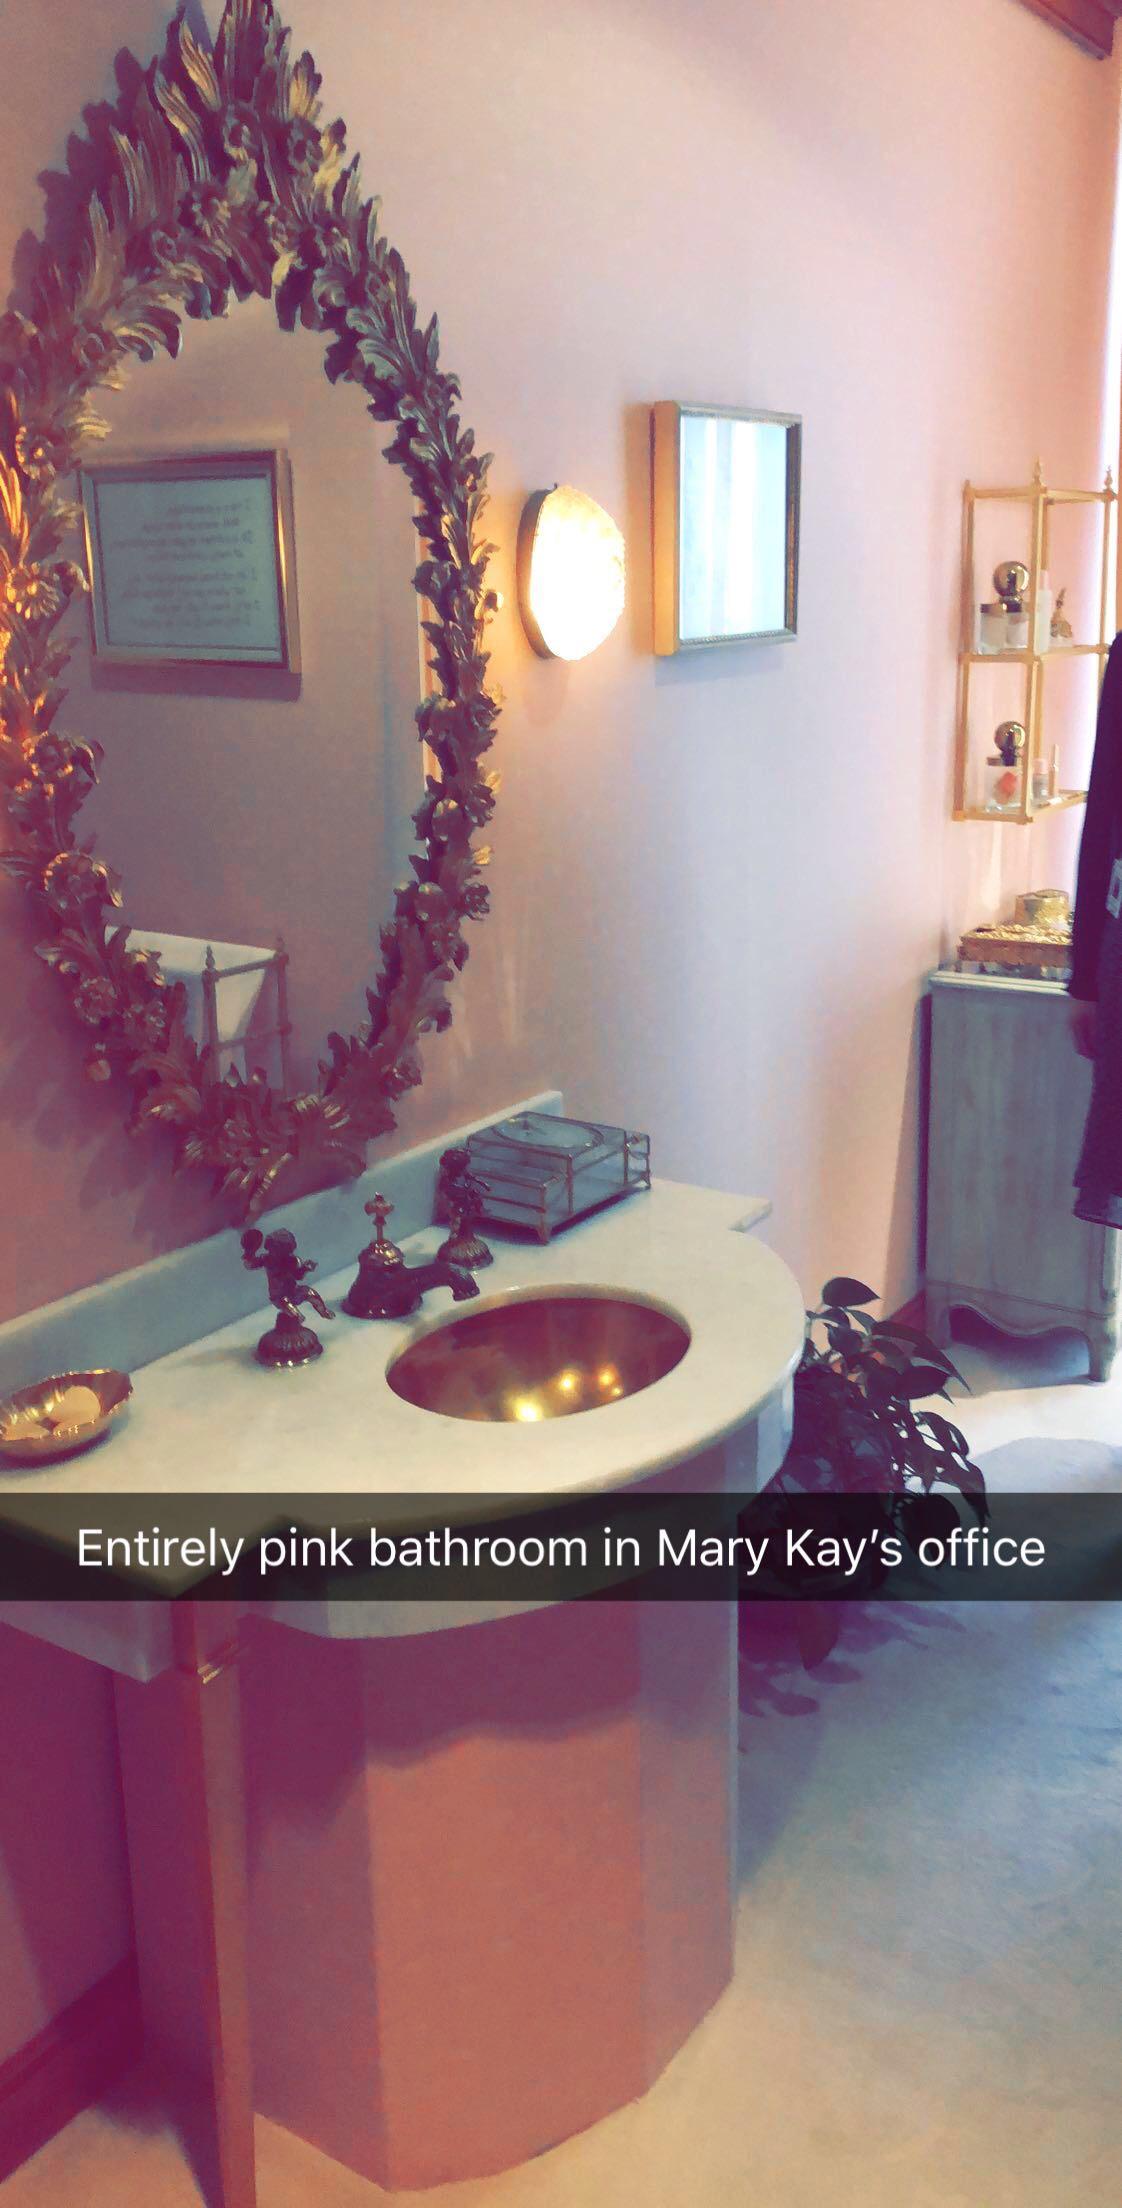 mary-kay-bathroom.JPG